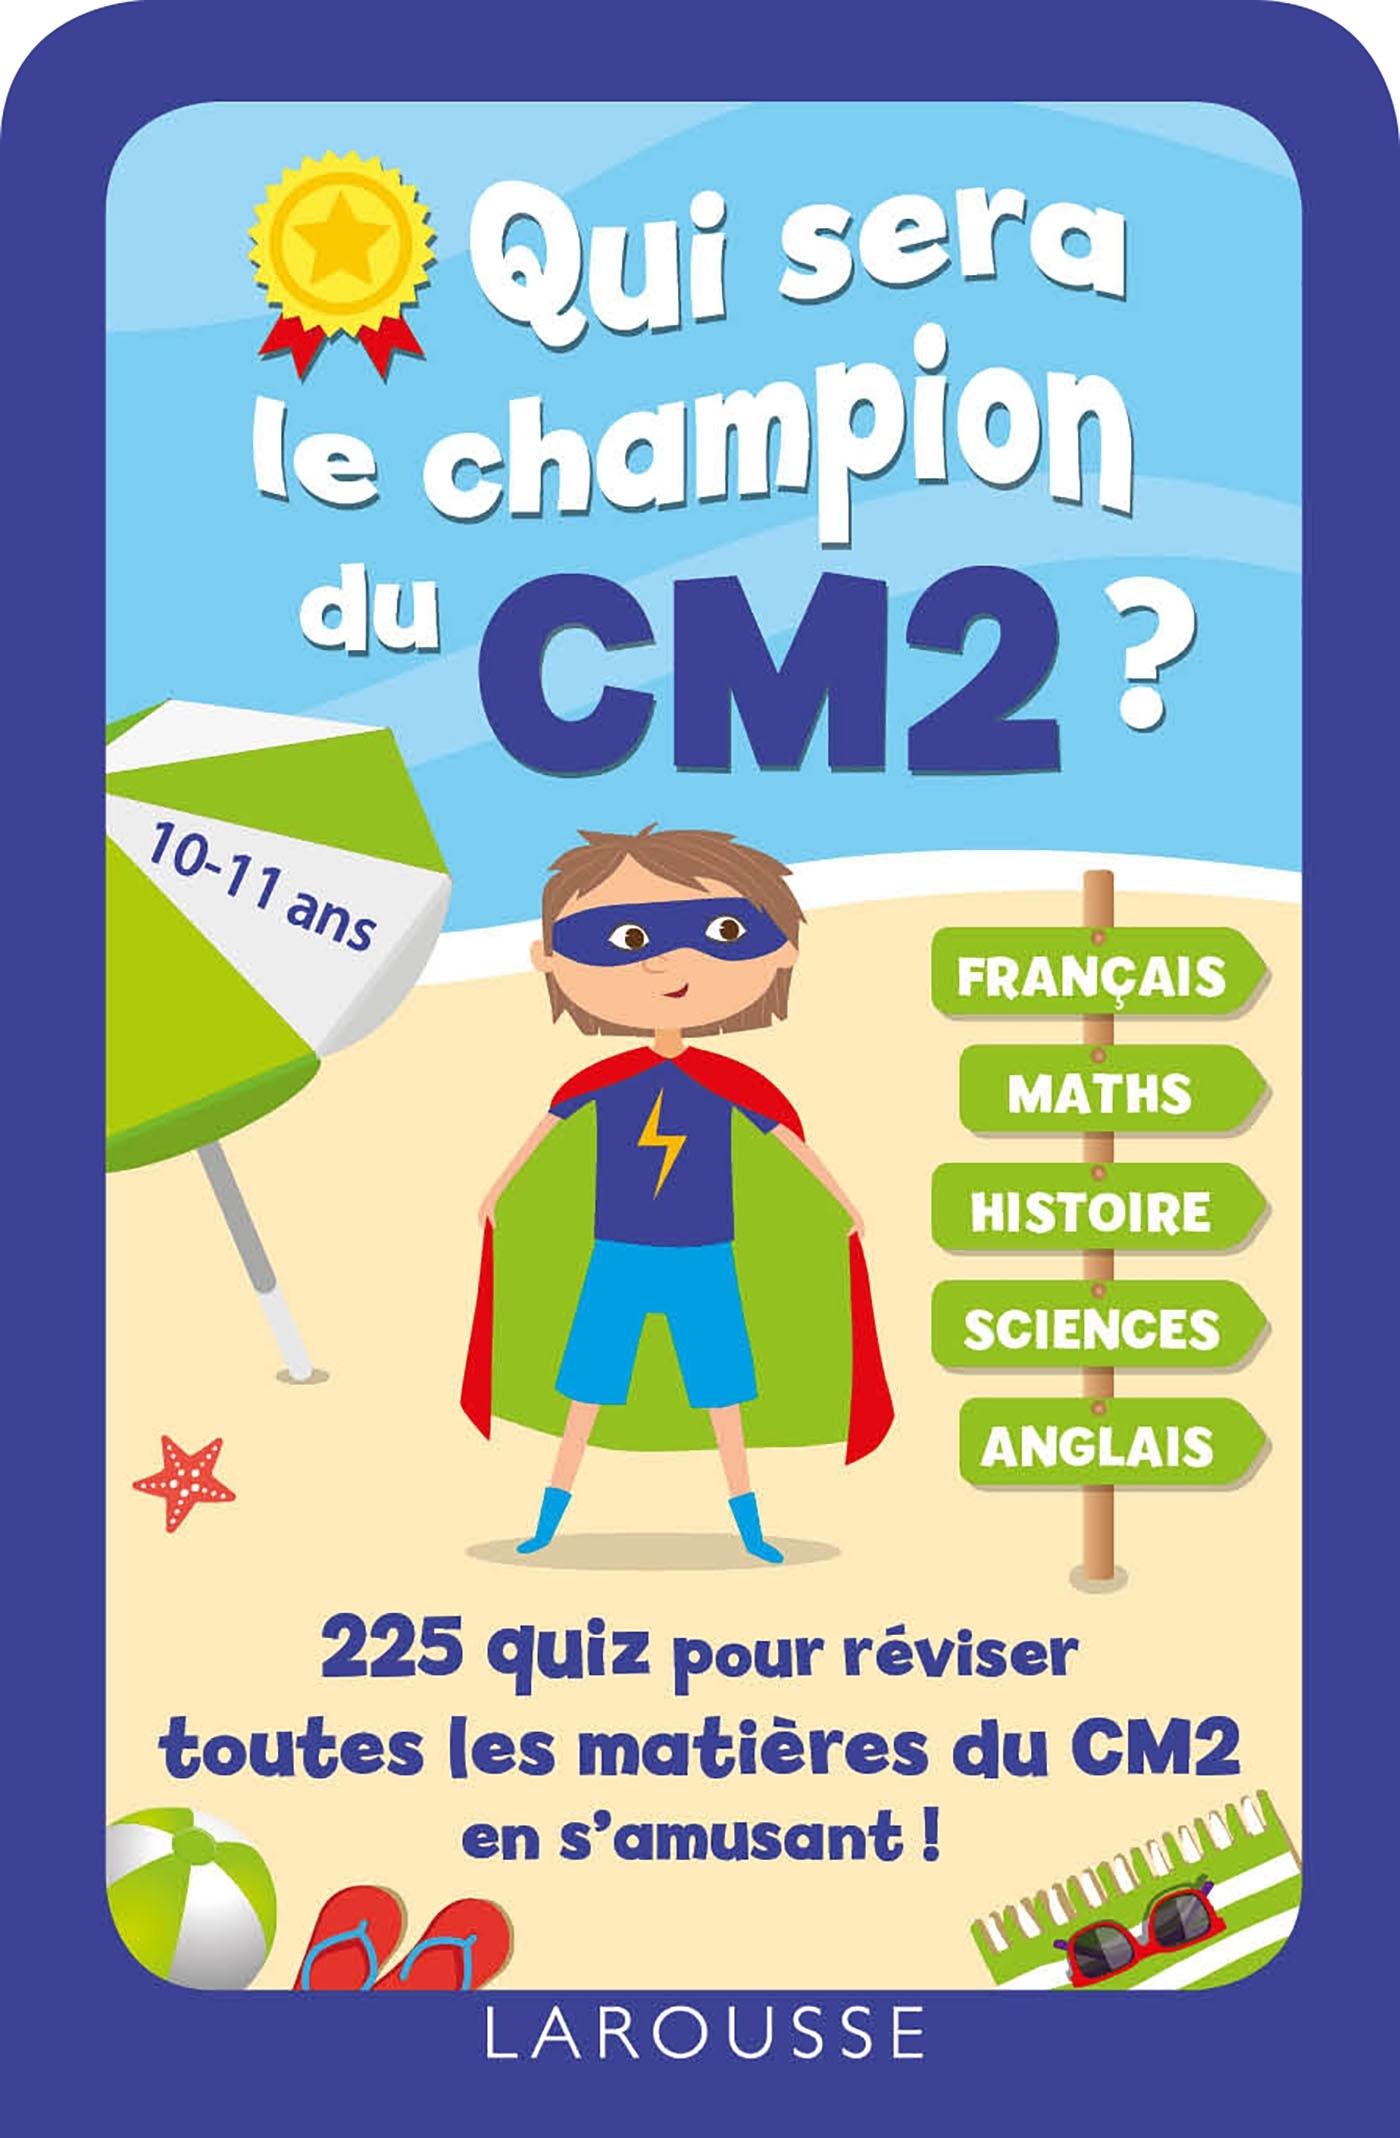 QUI SERA LE CHAMPION DU CM2 ?